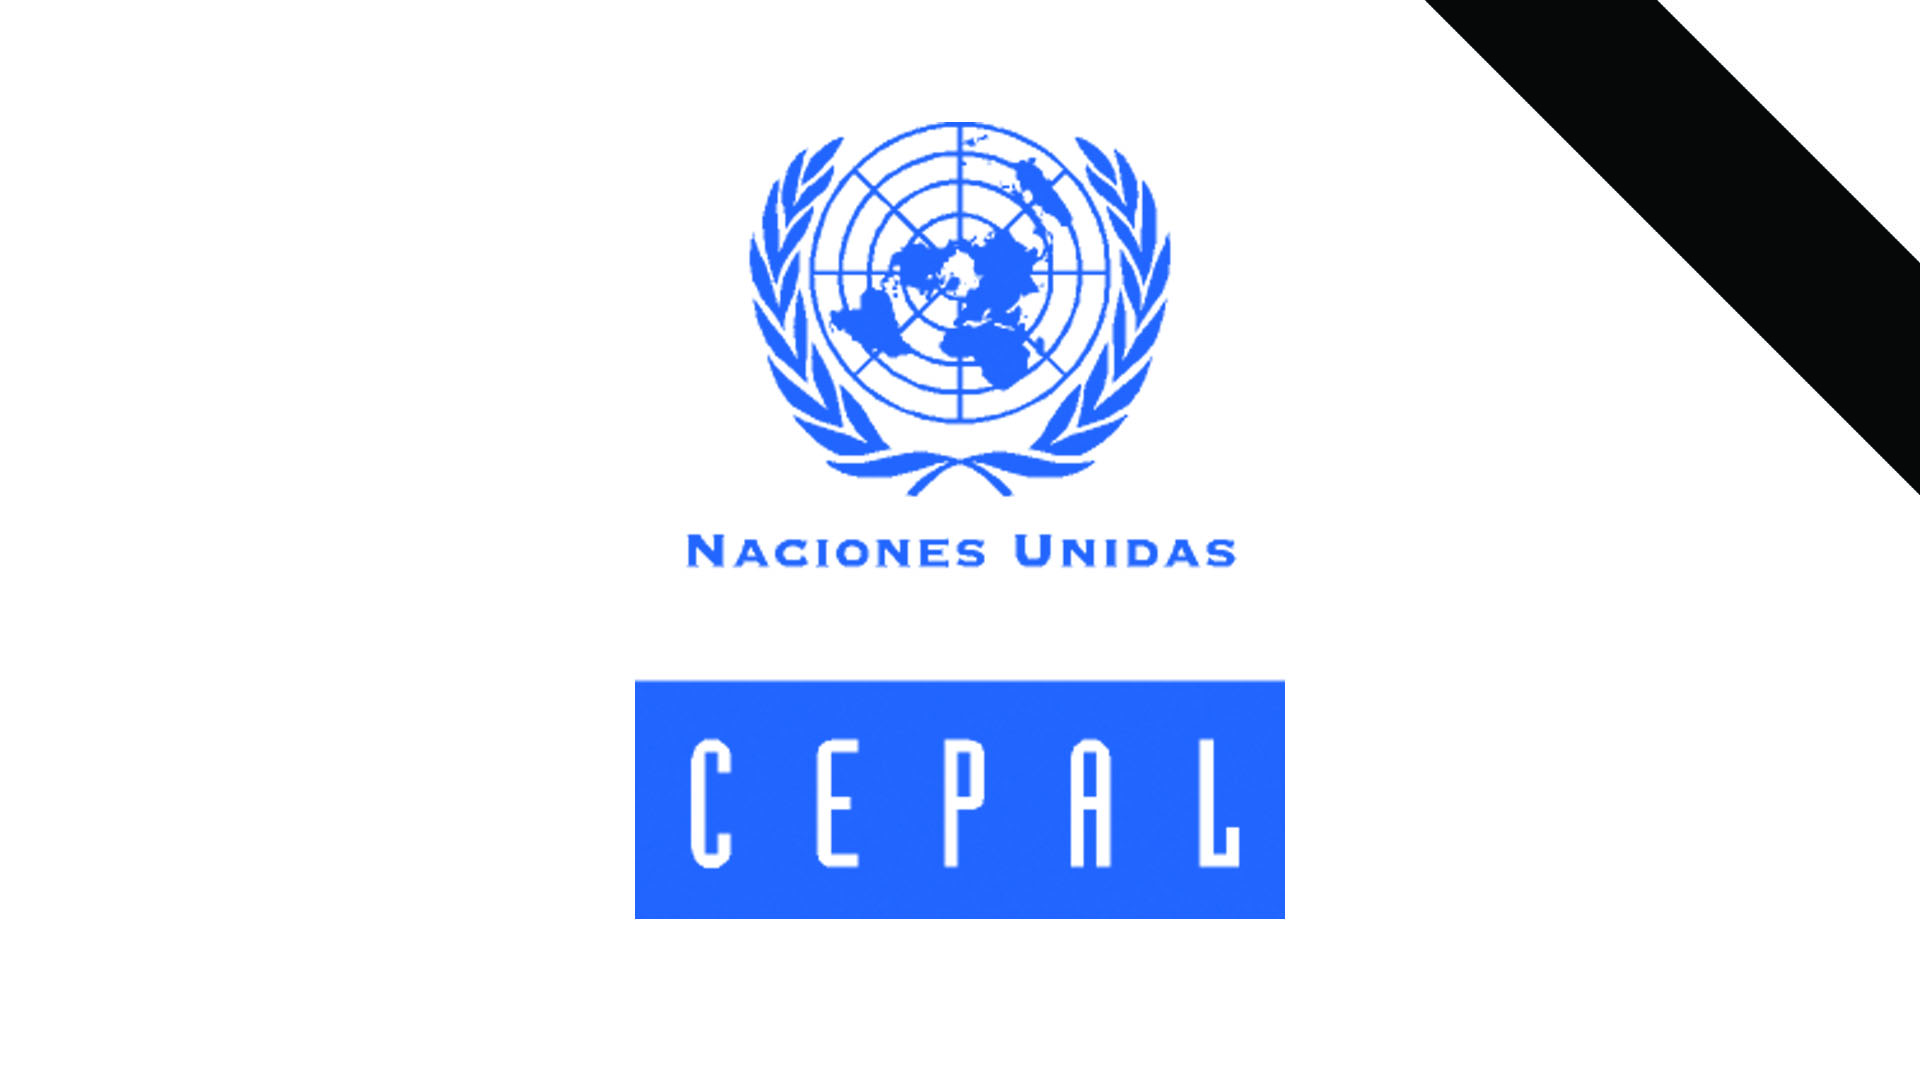 Logo de la CEPAL con banda negra de luto.